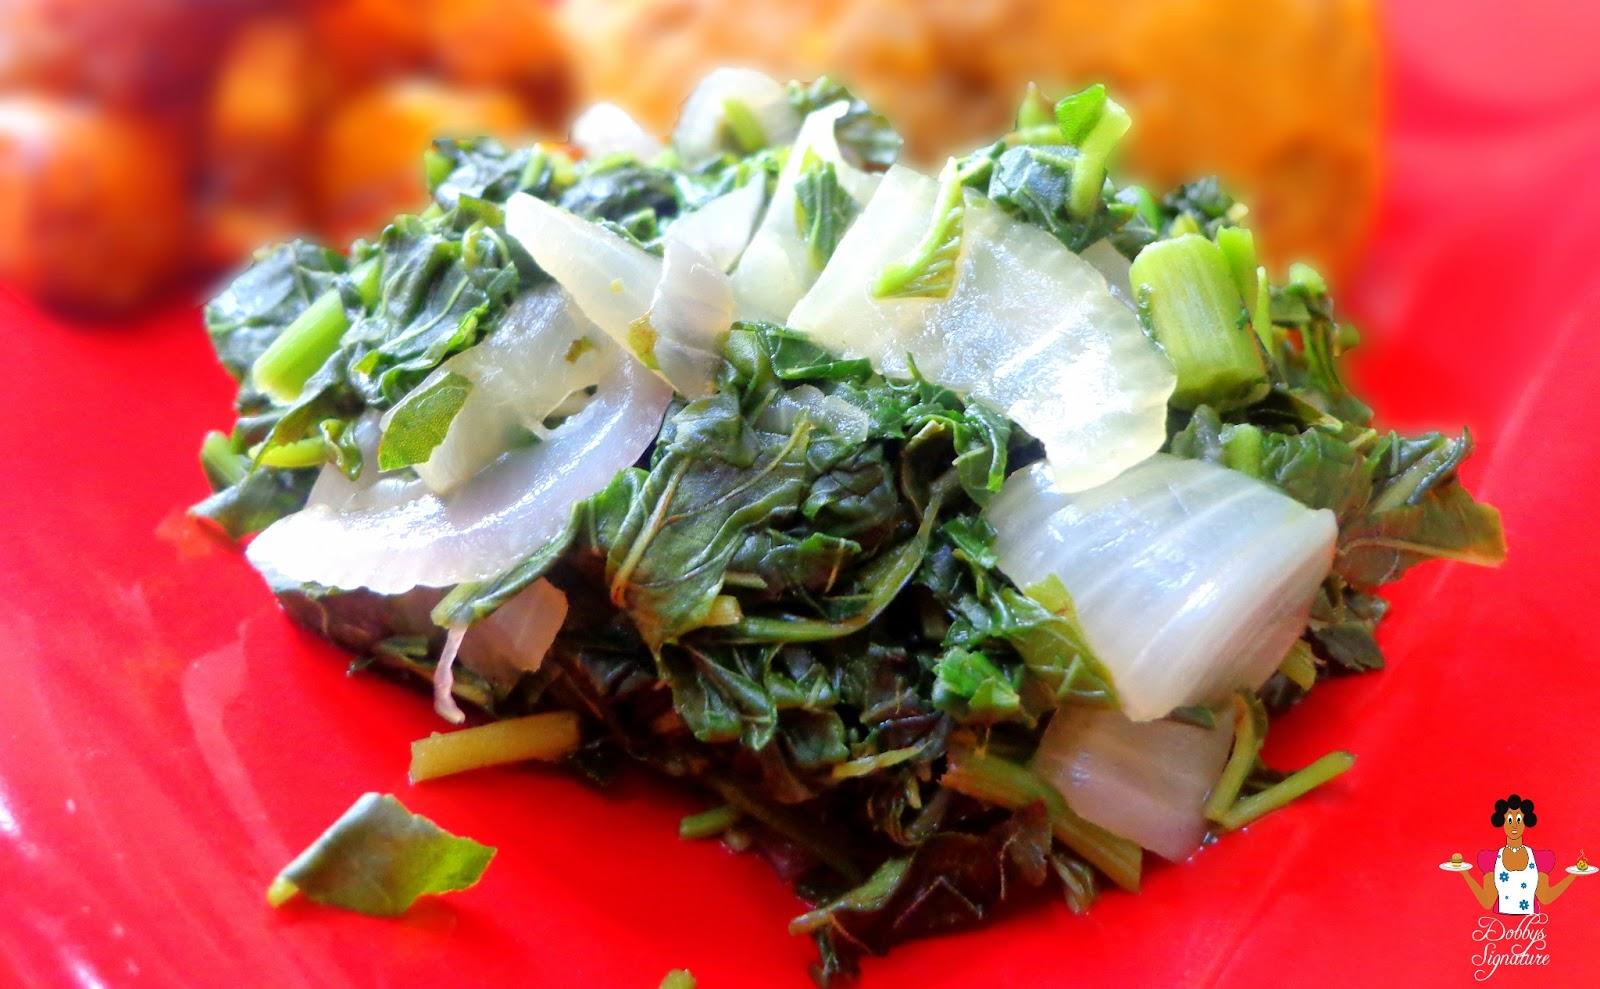 Dobbys signature nigerian food blog i nigerian food recipes i how to make steamed leafy green vegetables forumfinder Choice Image